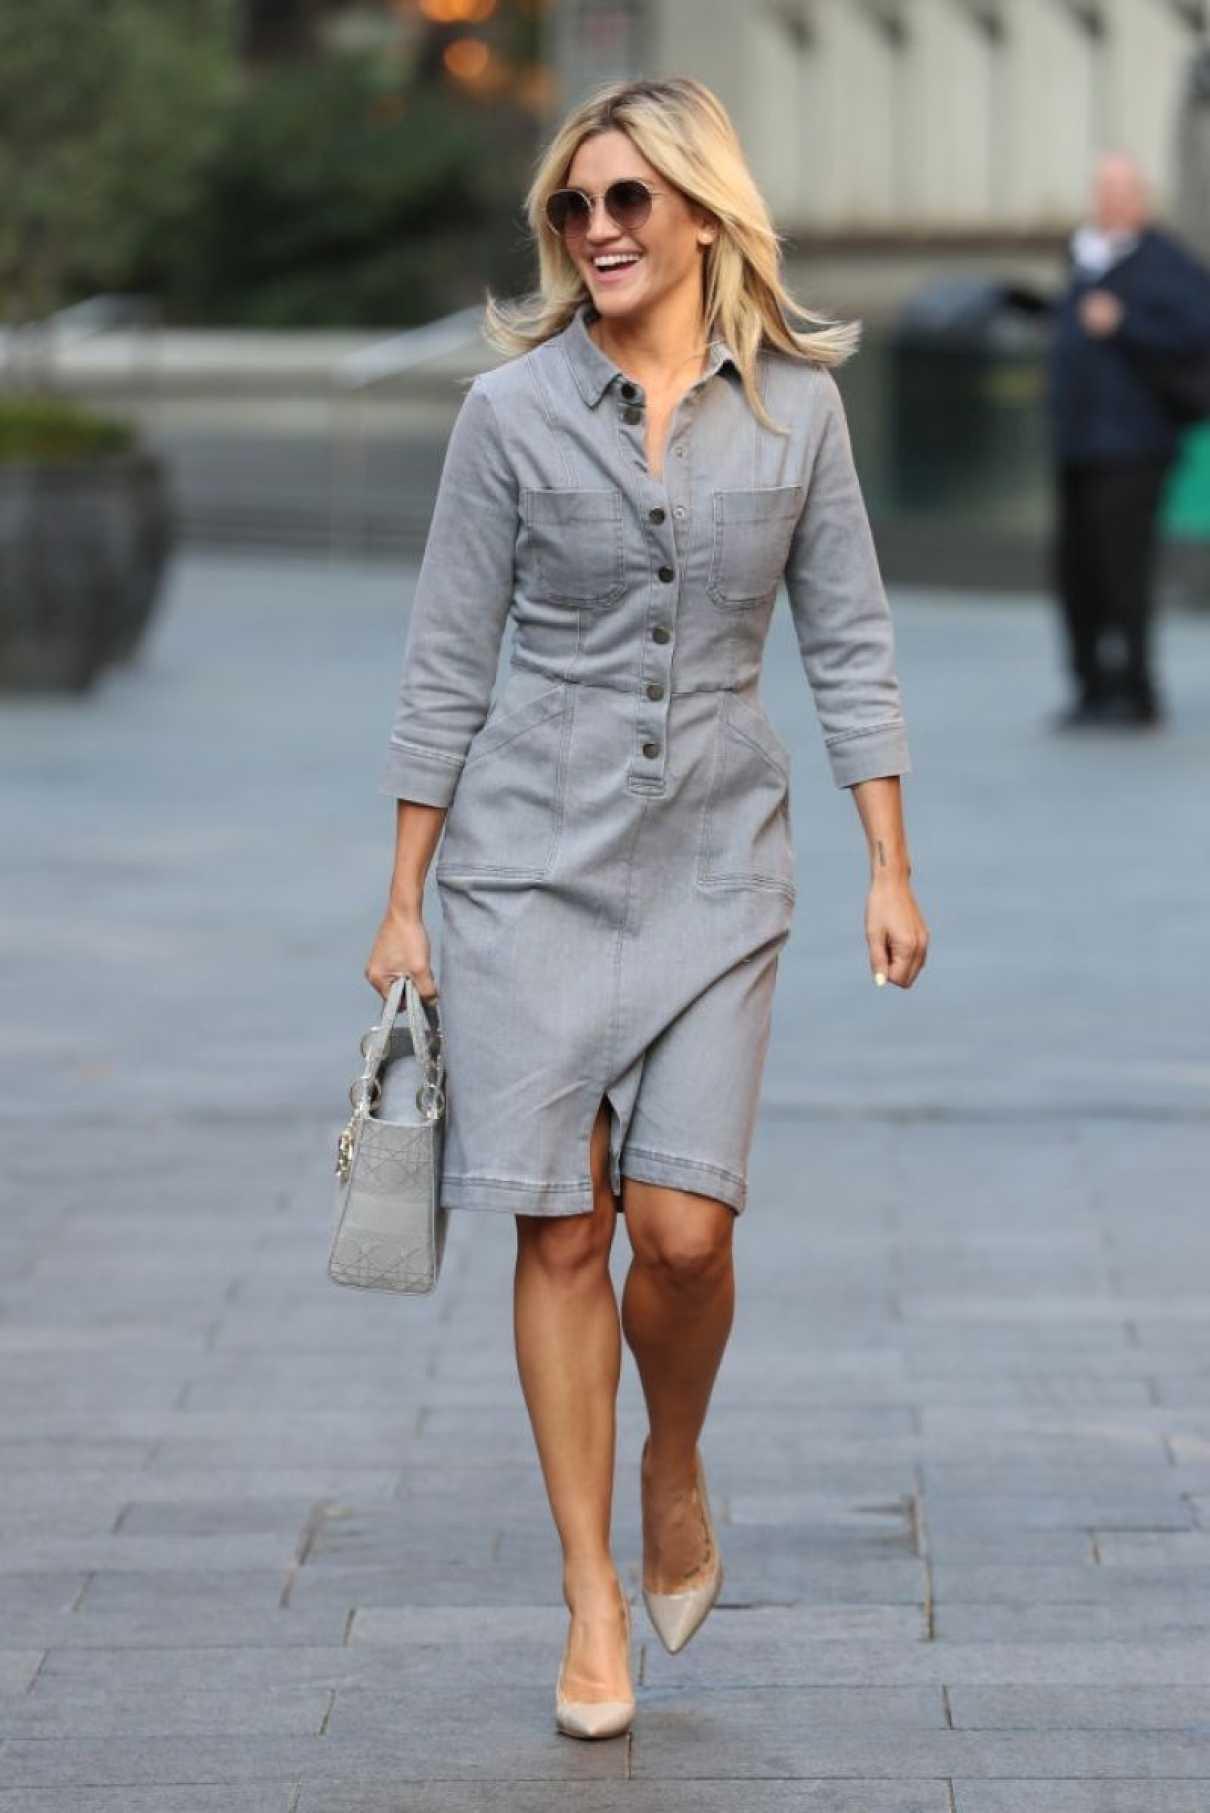 Ashley Roberts in a Grey Dress